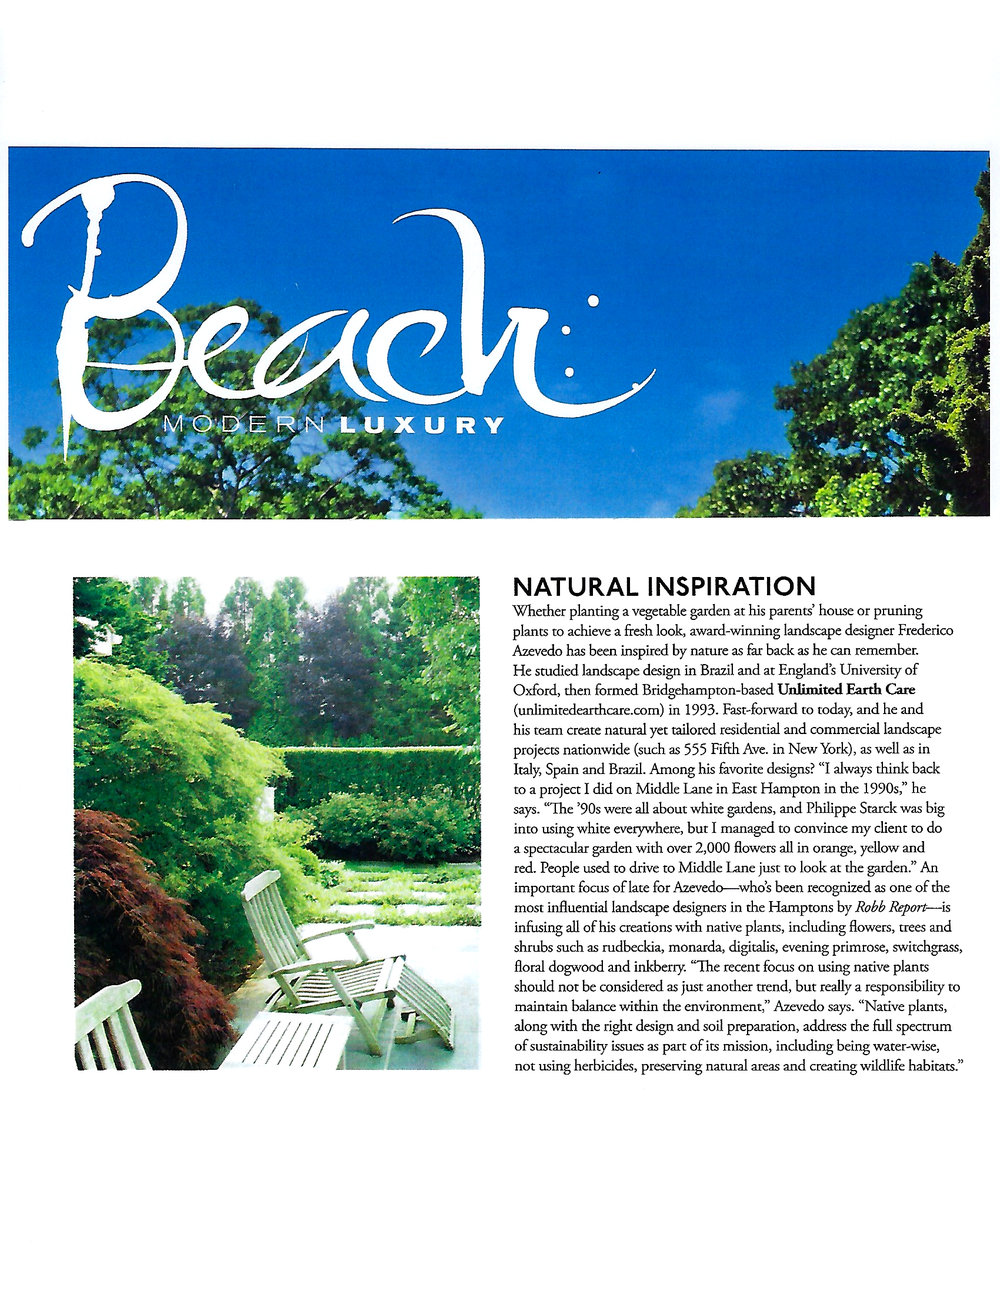 Beach Modern Luxury_Natural Inspiration_August 2017.jpg